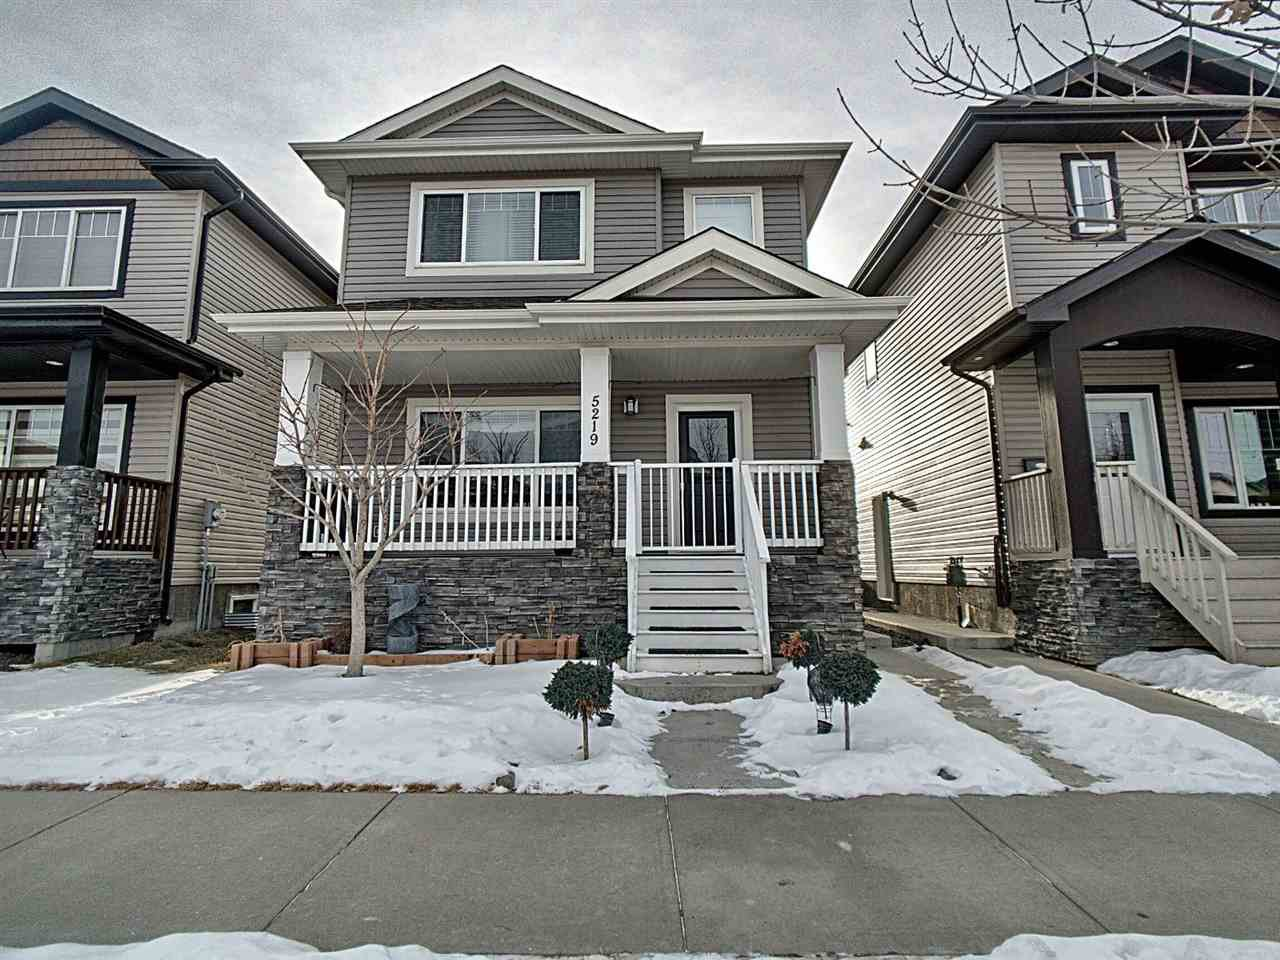 Main Photo: 5219 1A Avenue in Edmonton: Zone 53 House for sale : MLS®# E4224968